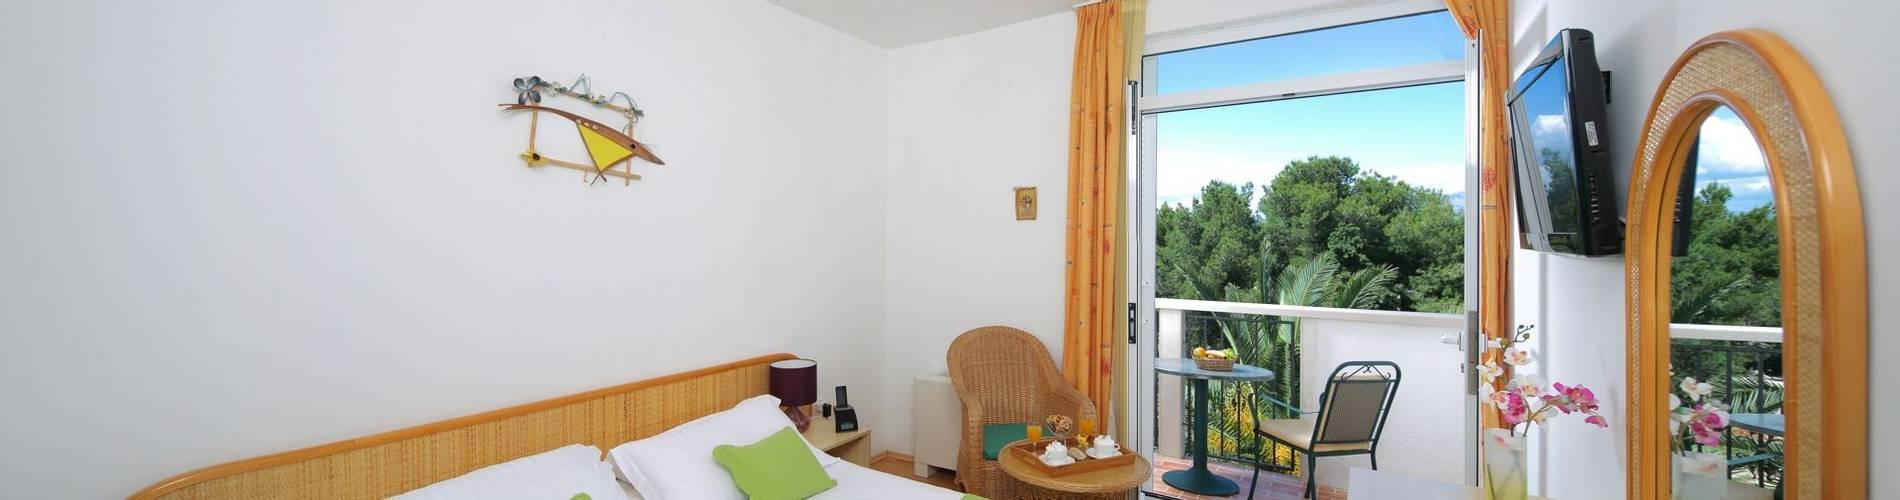 Hotel Villa ADRIATICA 2014 ZSuperior Double Room 9X19 panorama 14MB.jpg